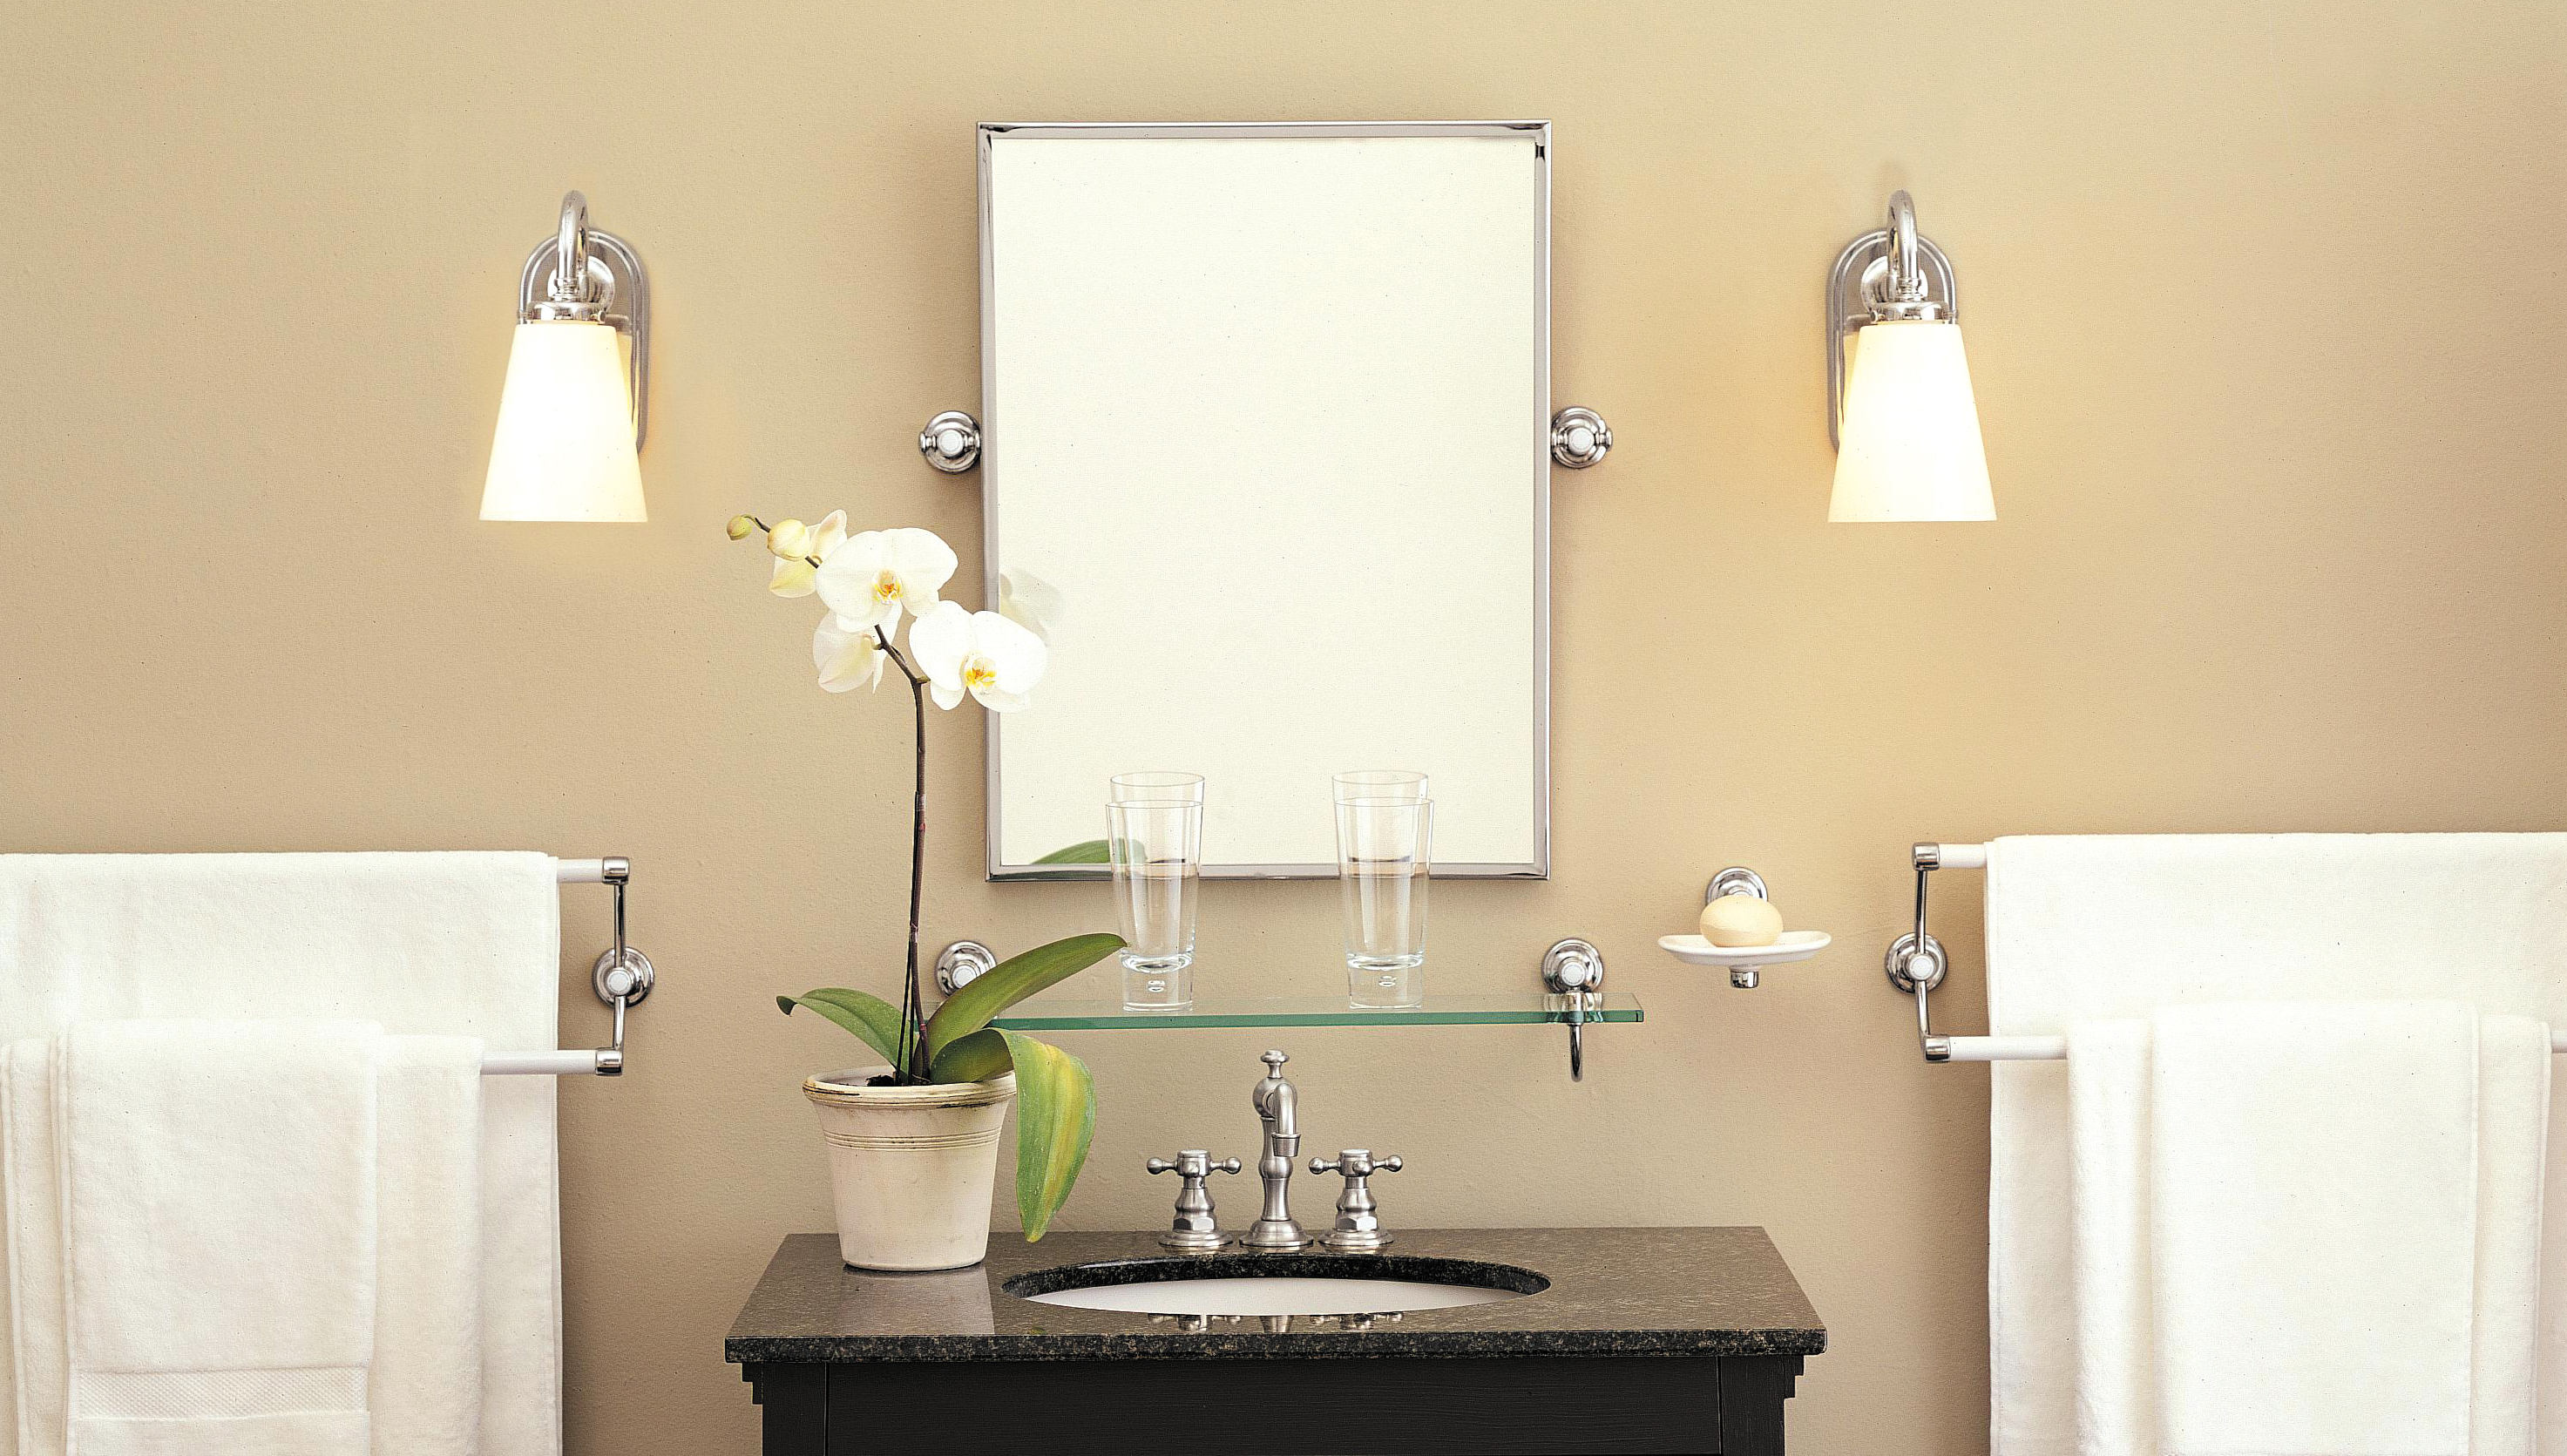 Подсветка в ванной в стиле ретро